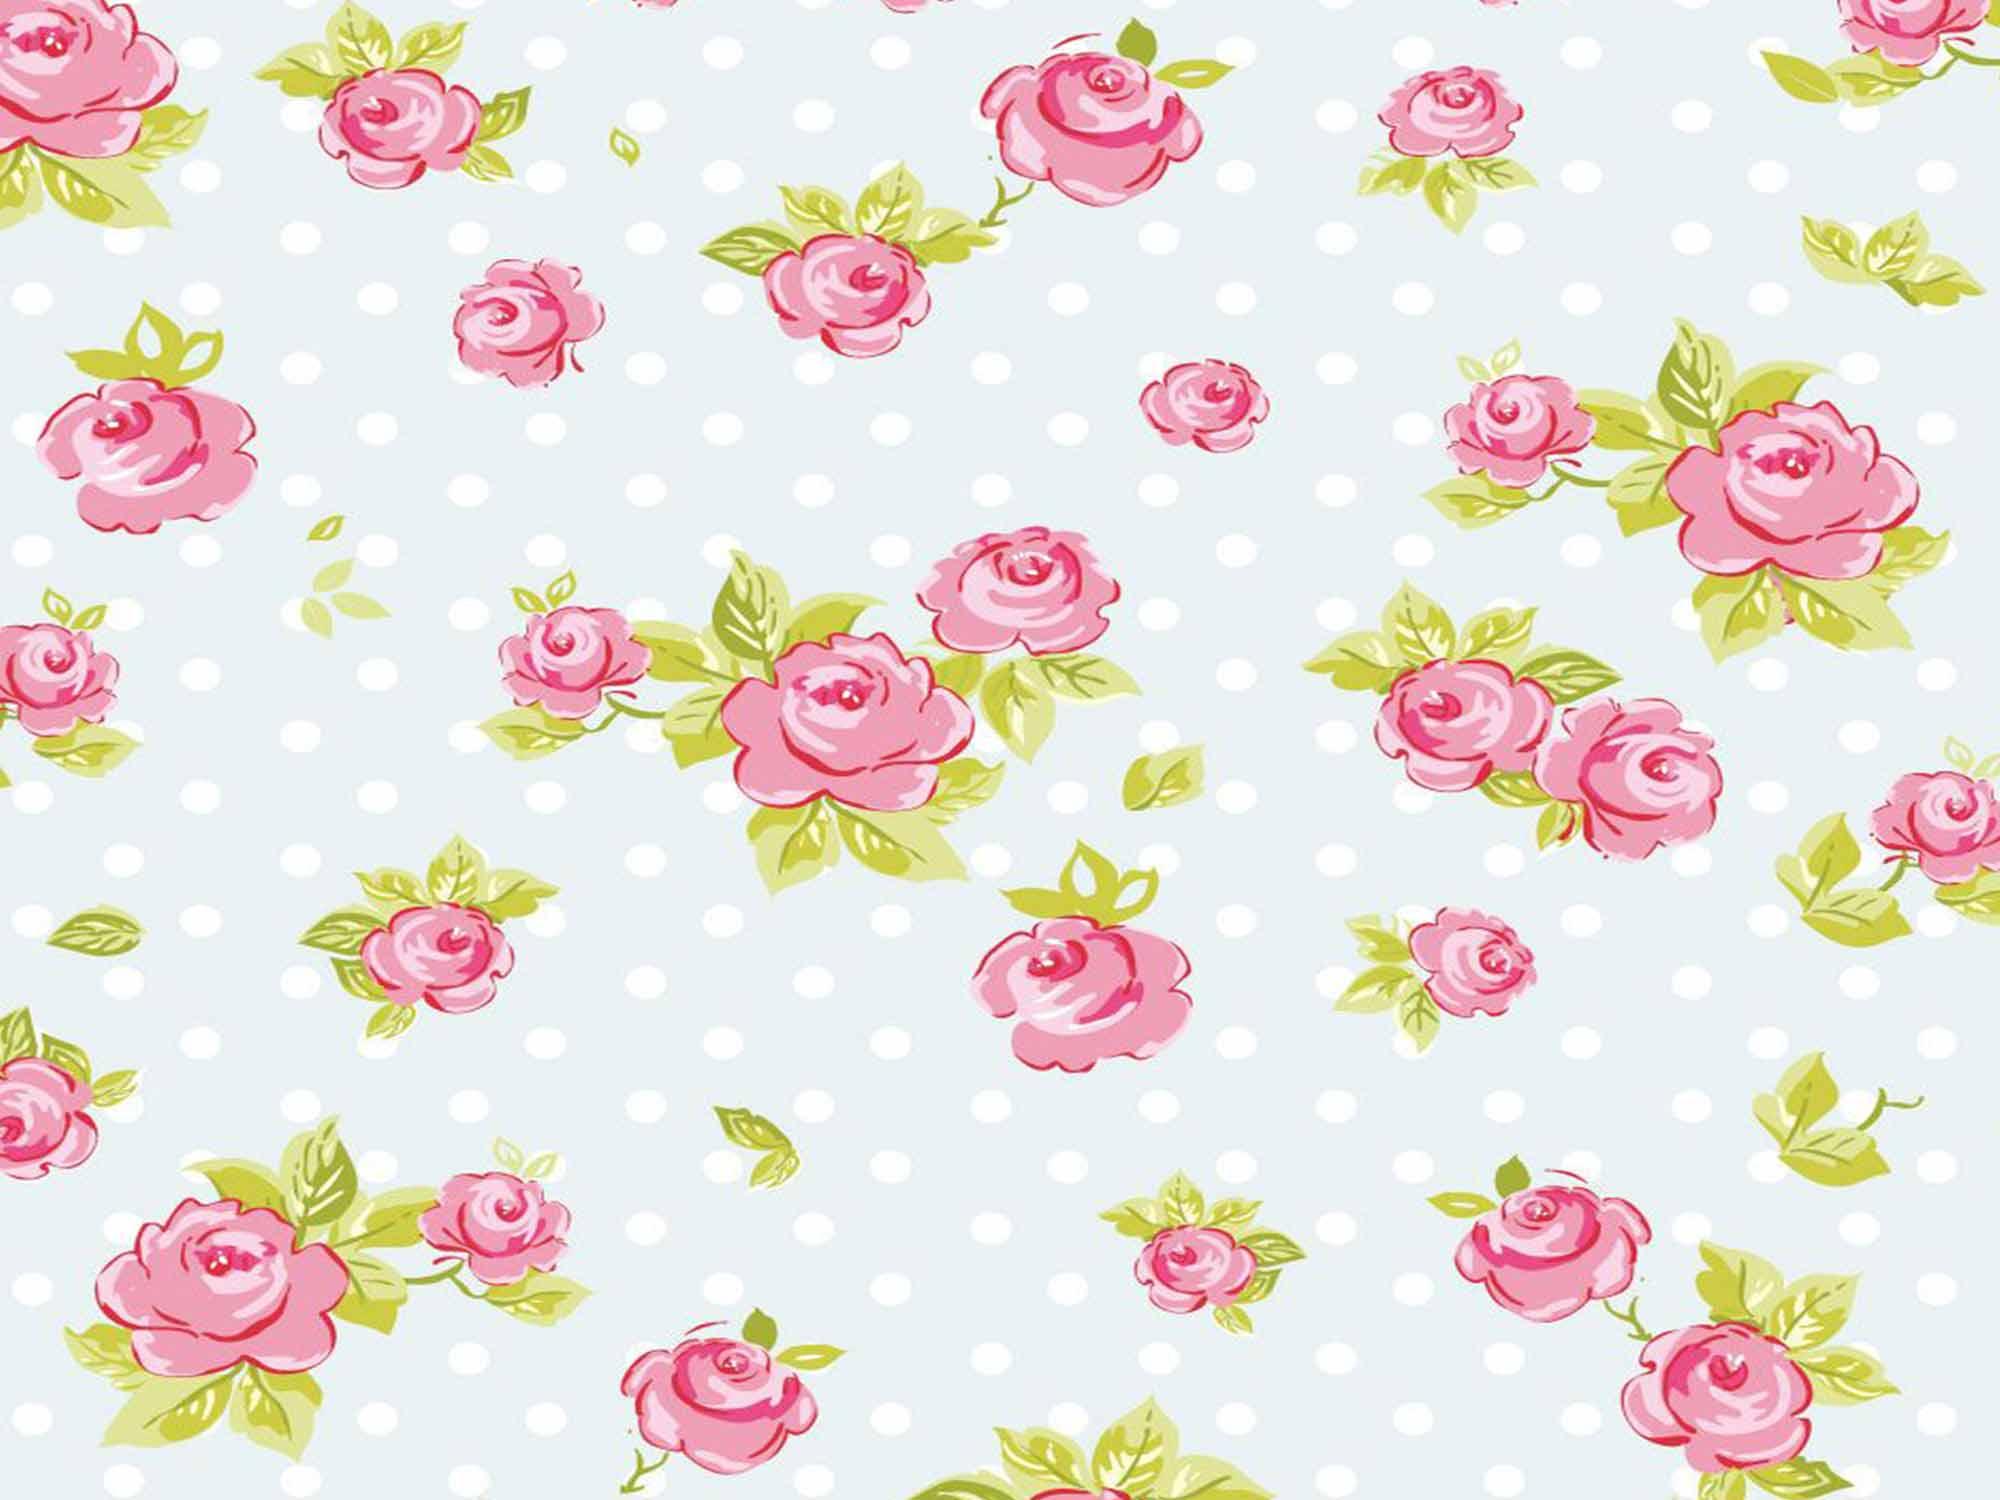 Papel de Parede Floral 0008 - Adesivos de Parede  - Paredes Decoradas